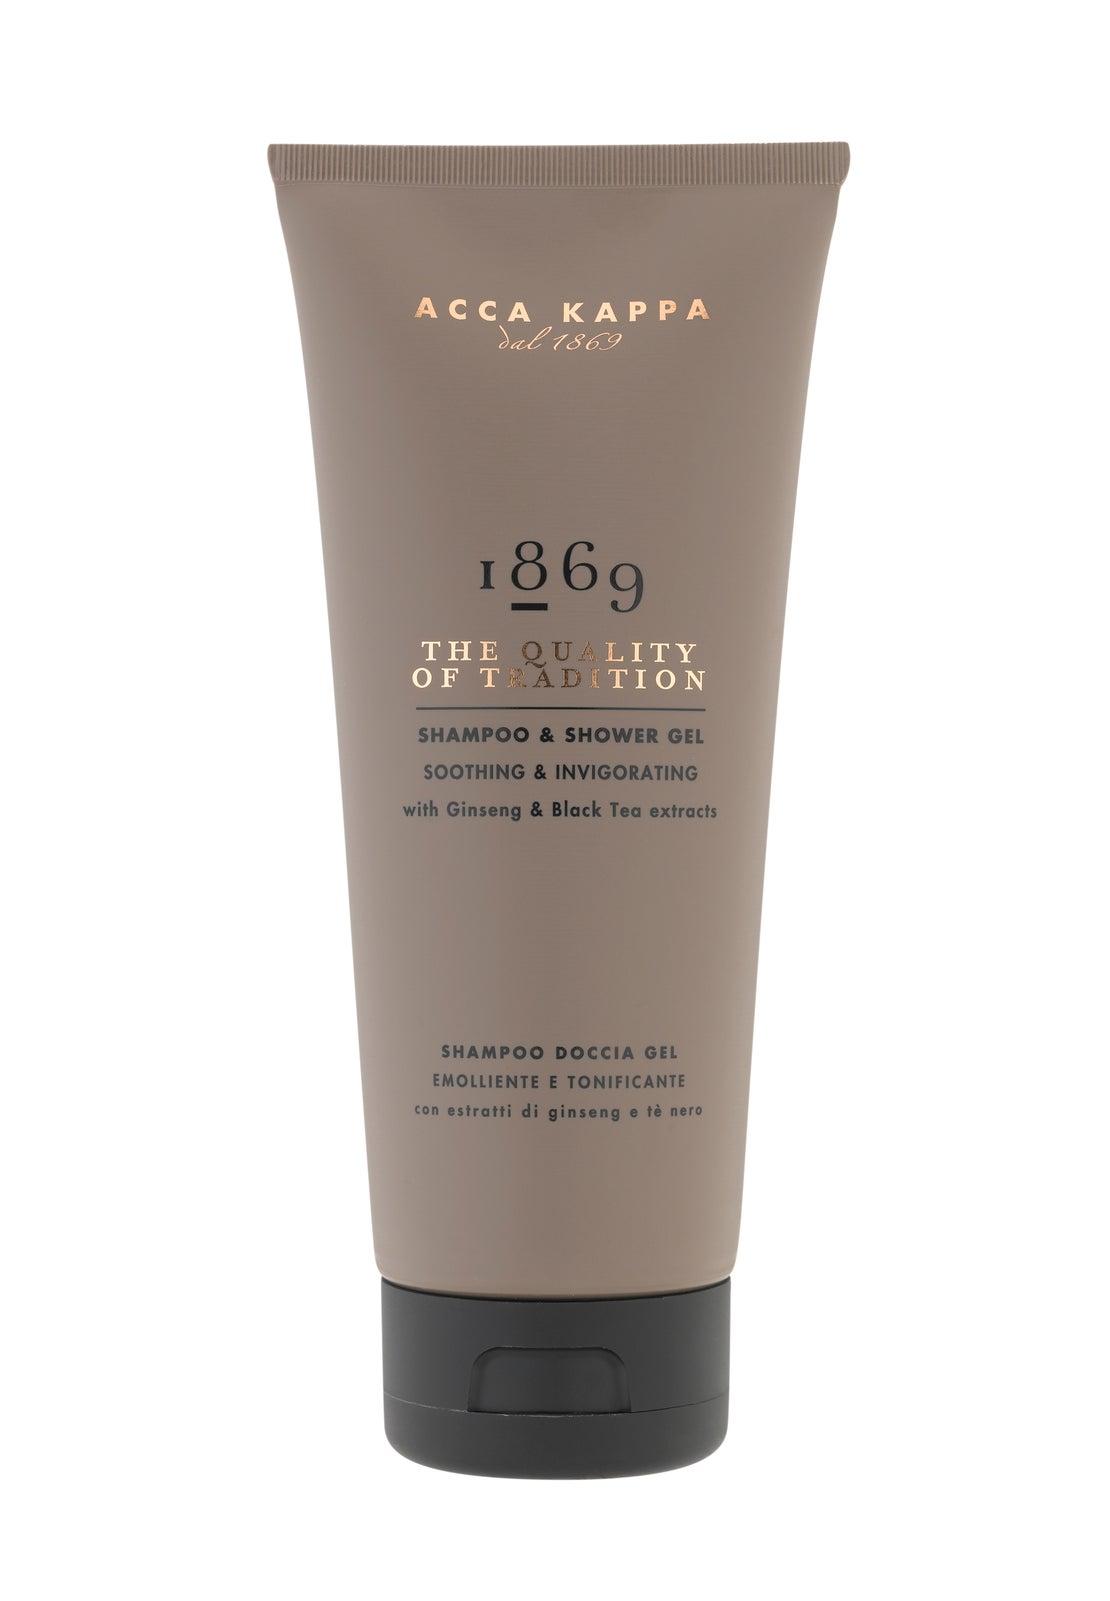 Acca Kappa - 1869 Shampoo and Shower Gel